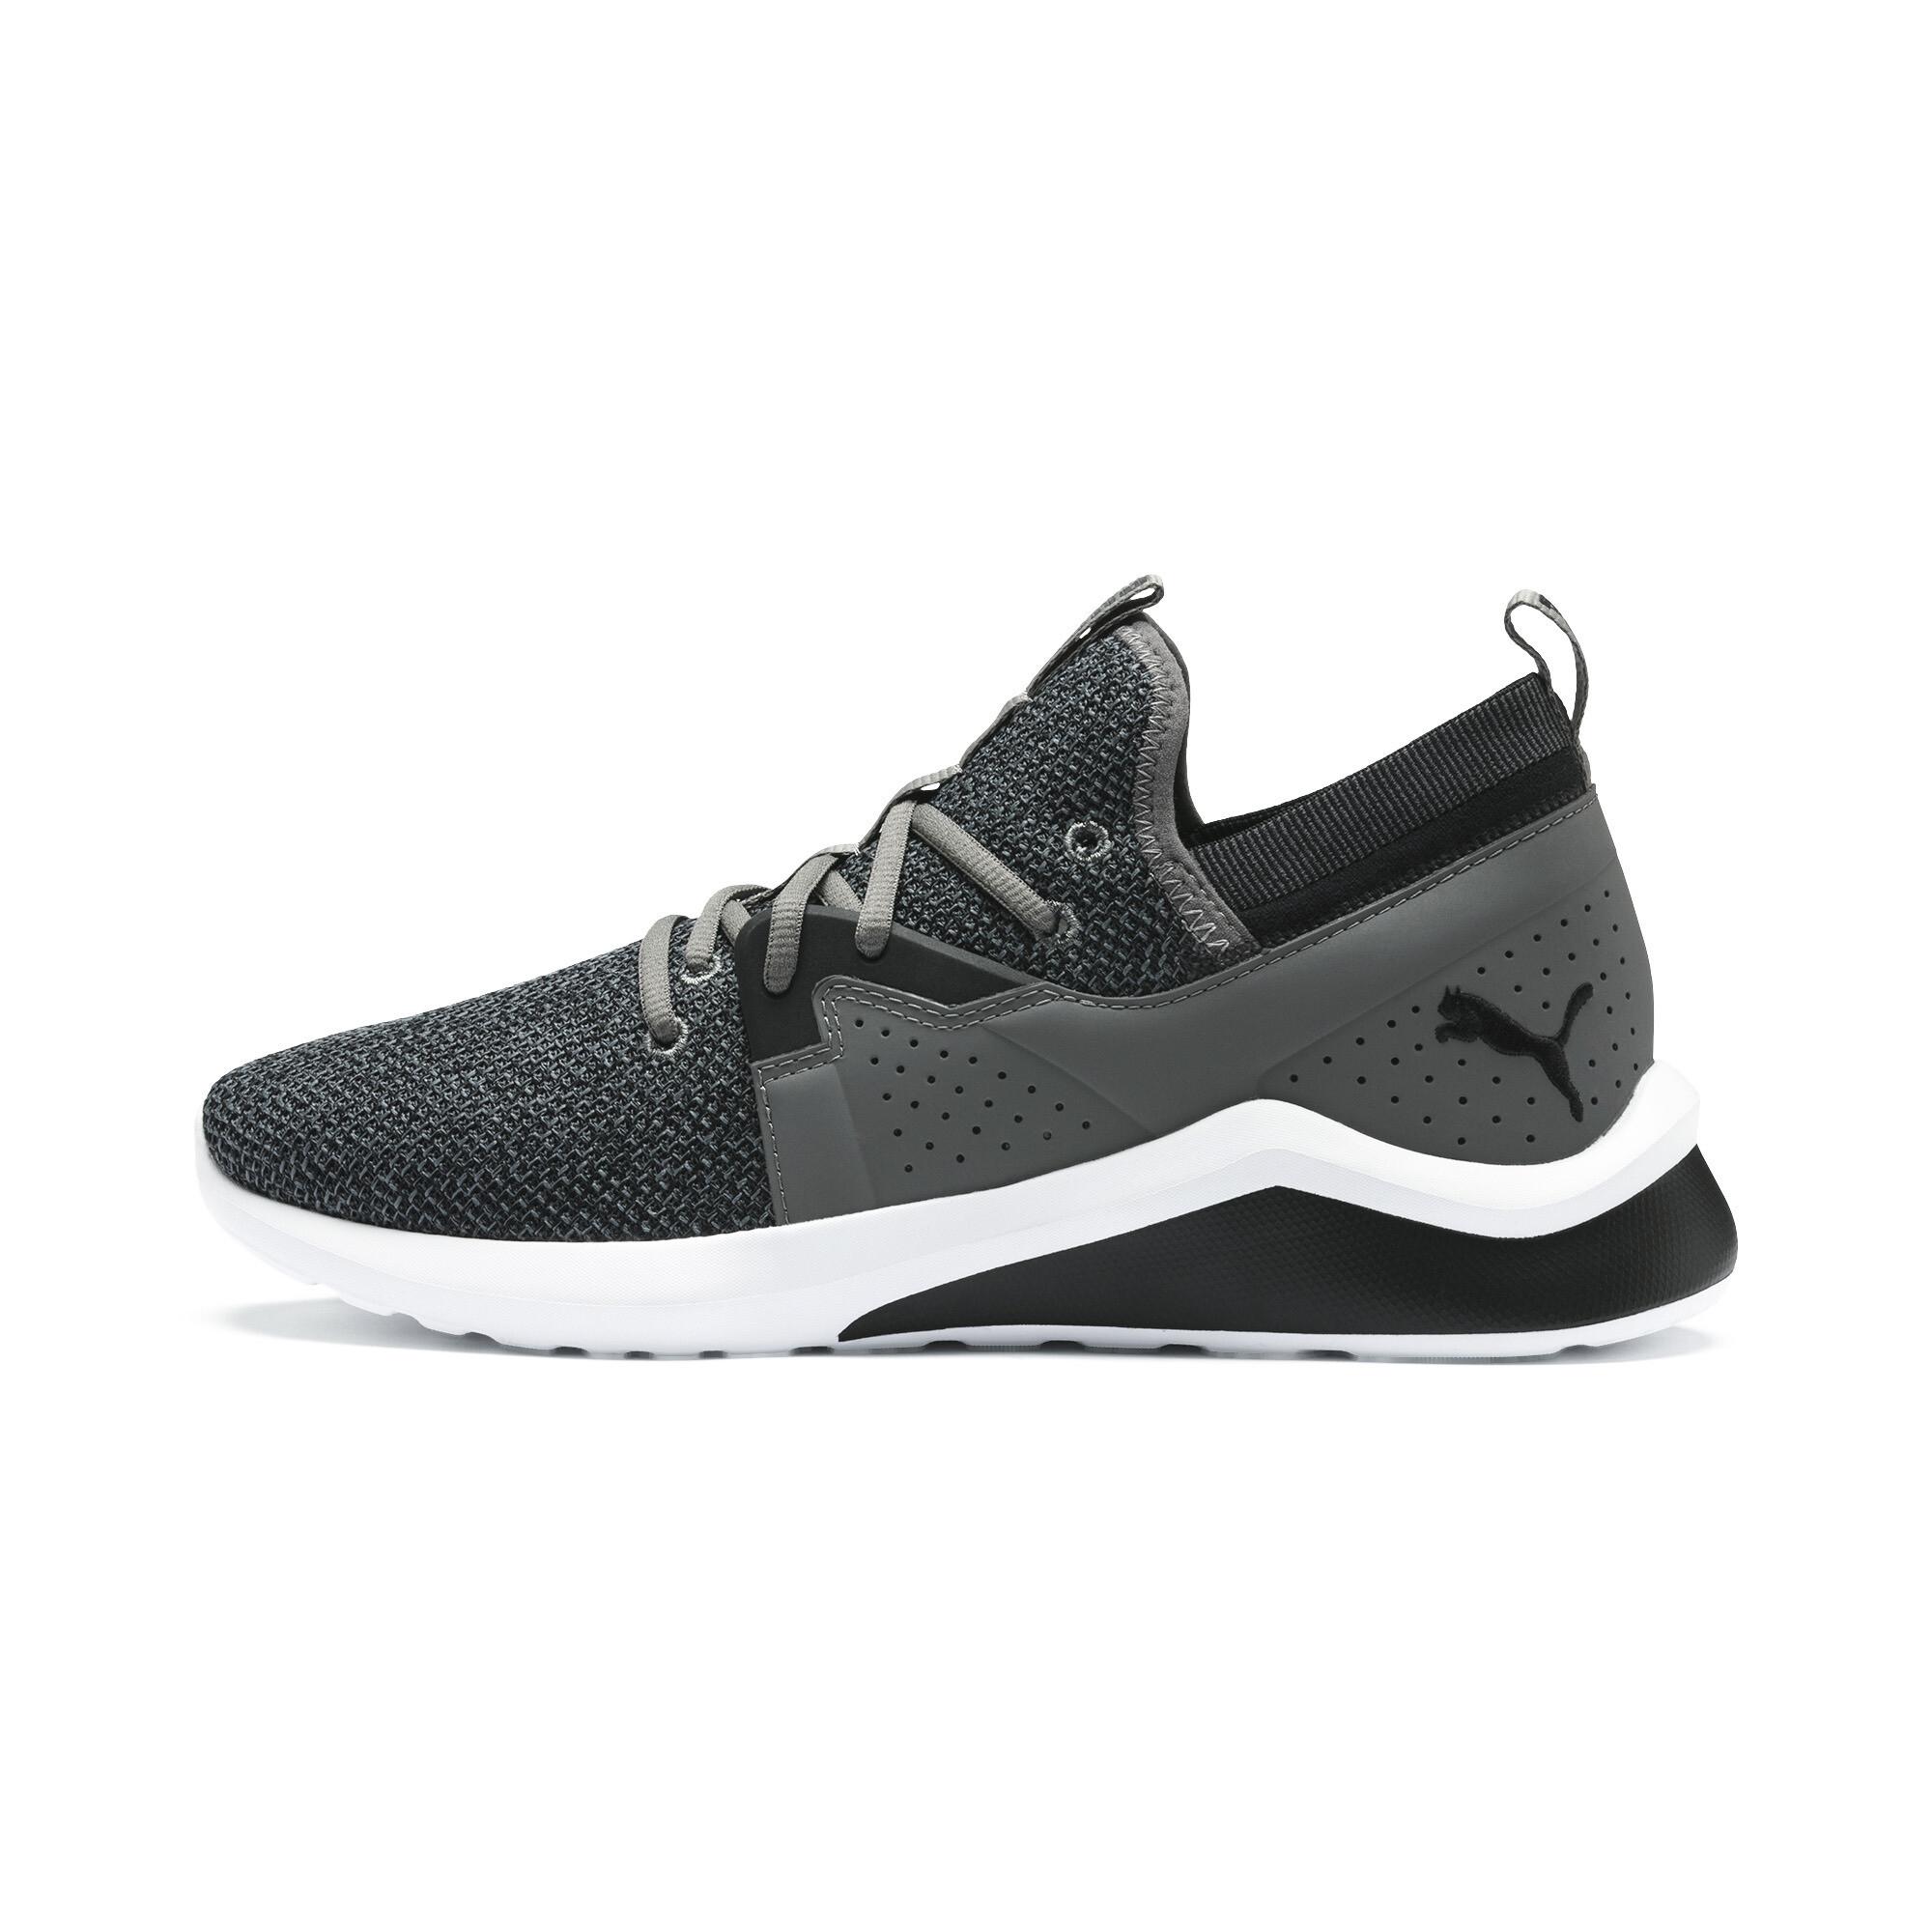 PUMA-Emergence-Men-039-s-Sneakers-Men-Shoe-Running thumbnail 16